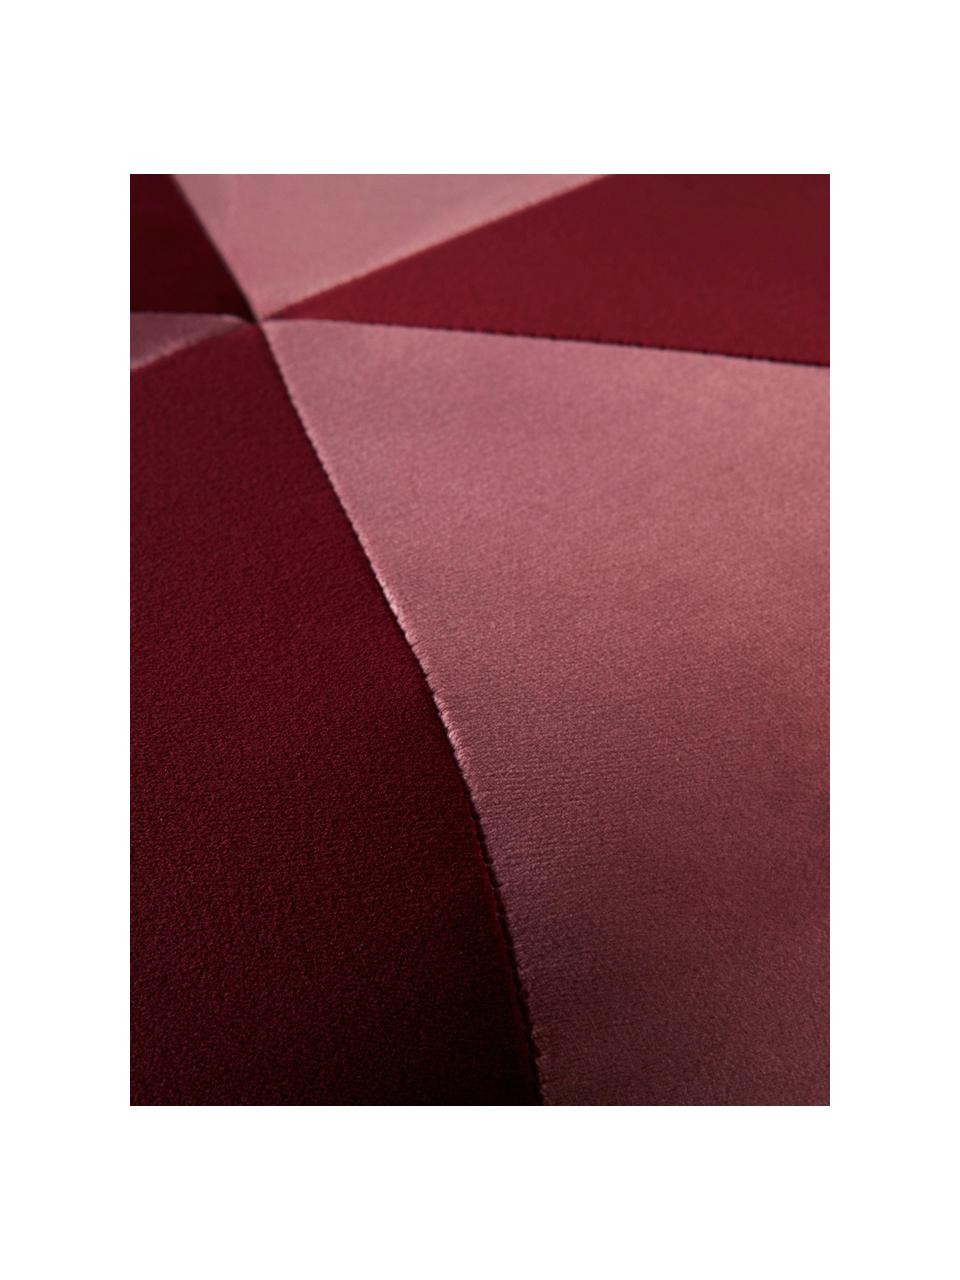 Samt-Kinder-Pouf Barcelona, Bezug: Polyestersamt, Gestell: Holz, Rot, Rosa, Ø 40 x H 28 cm